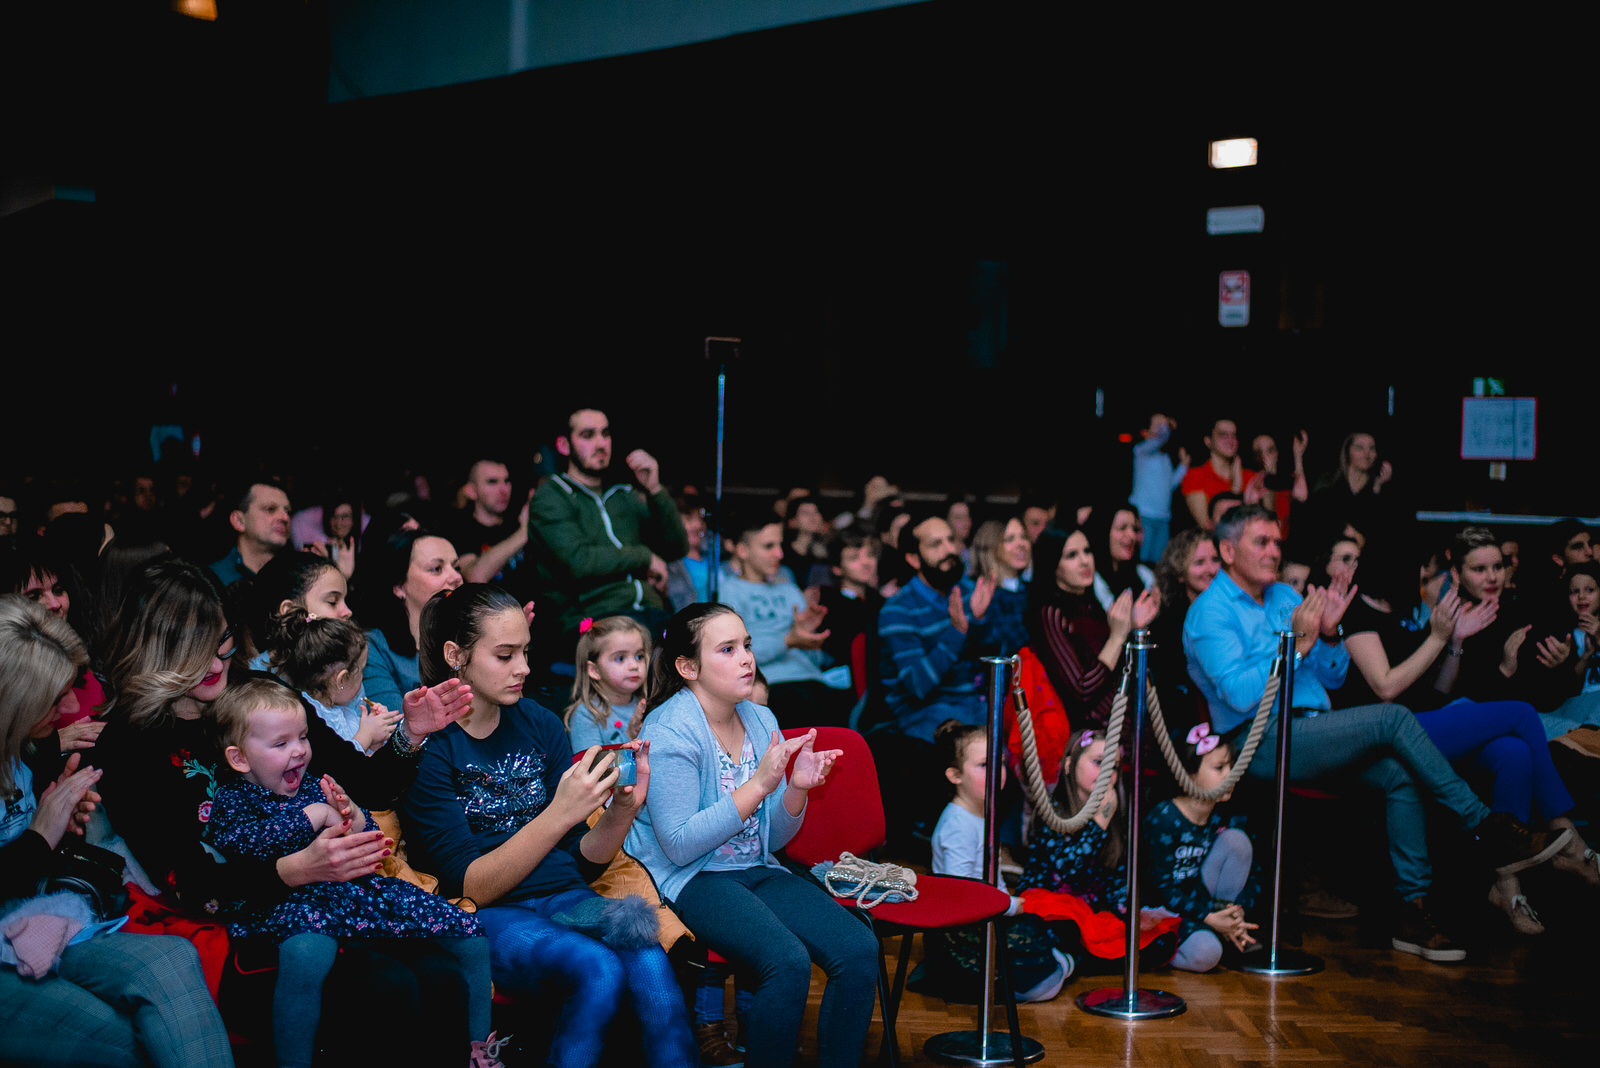 likaclub_gospić_prvi-pljesak-2018-22